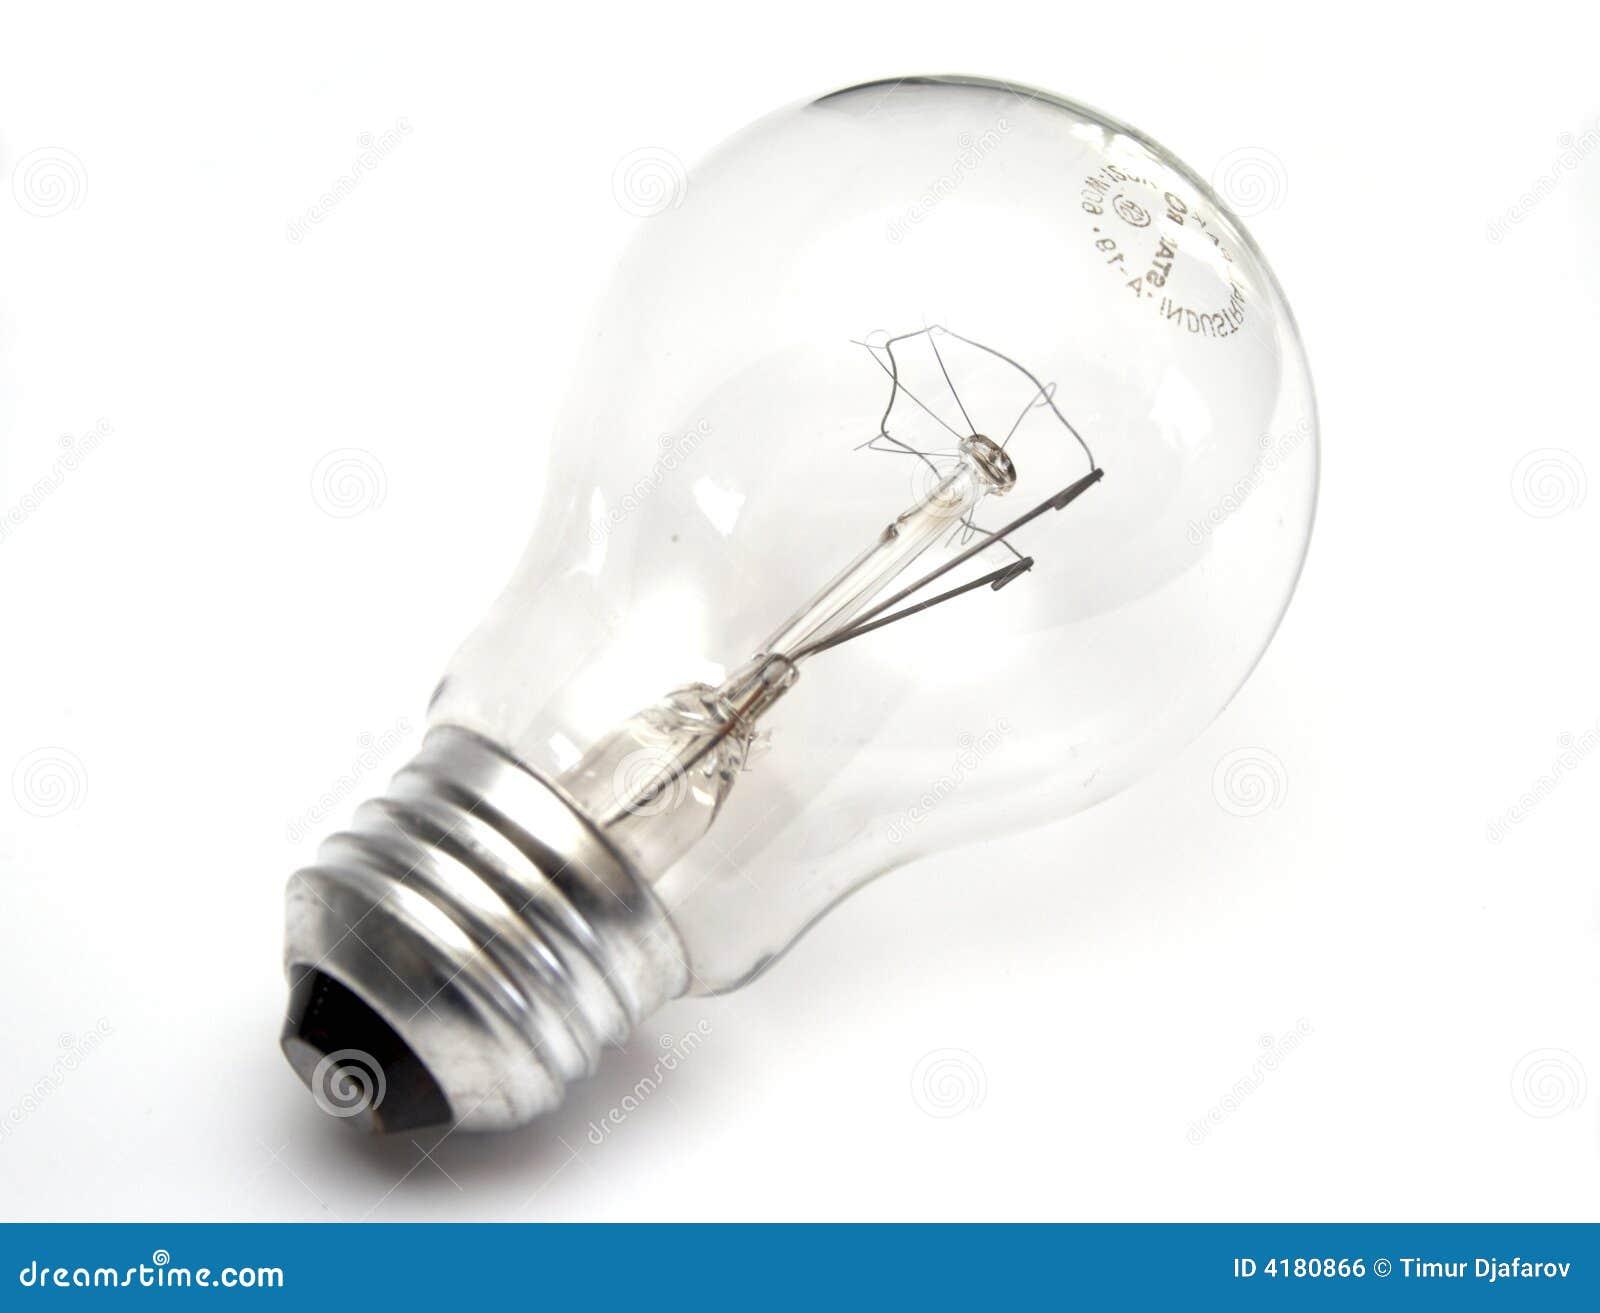 Light Bulb At White Background Royalty Free Stock Image Image 4180866